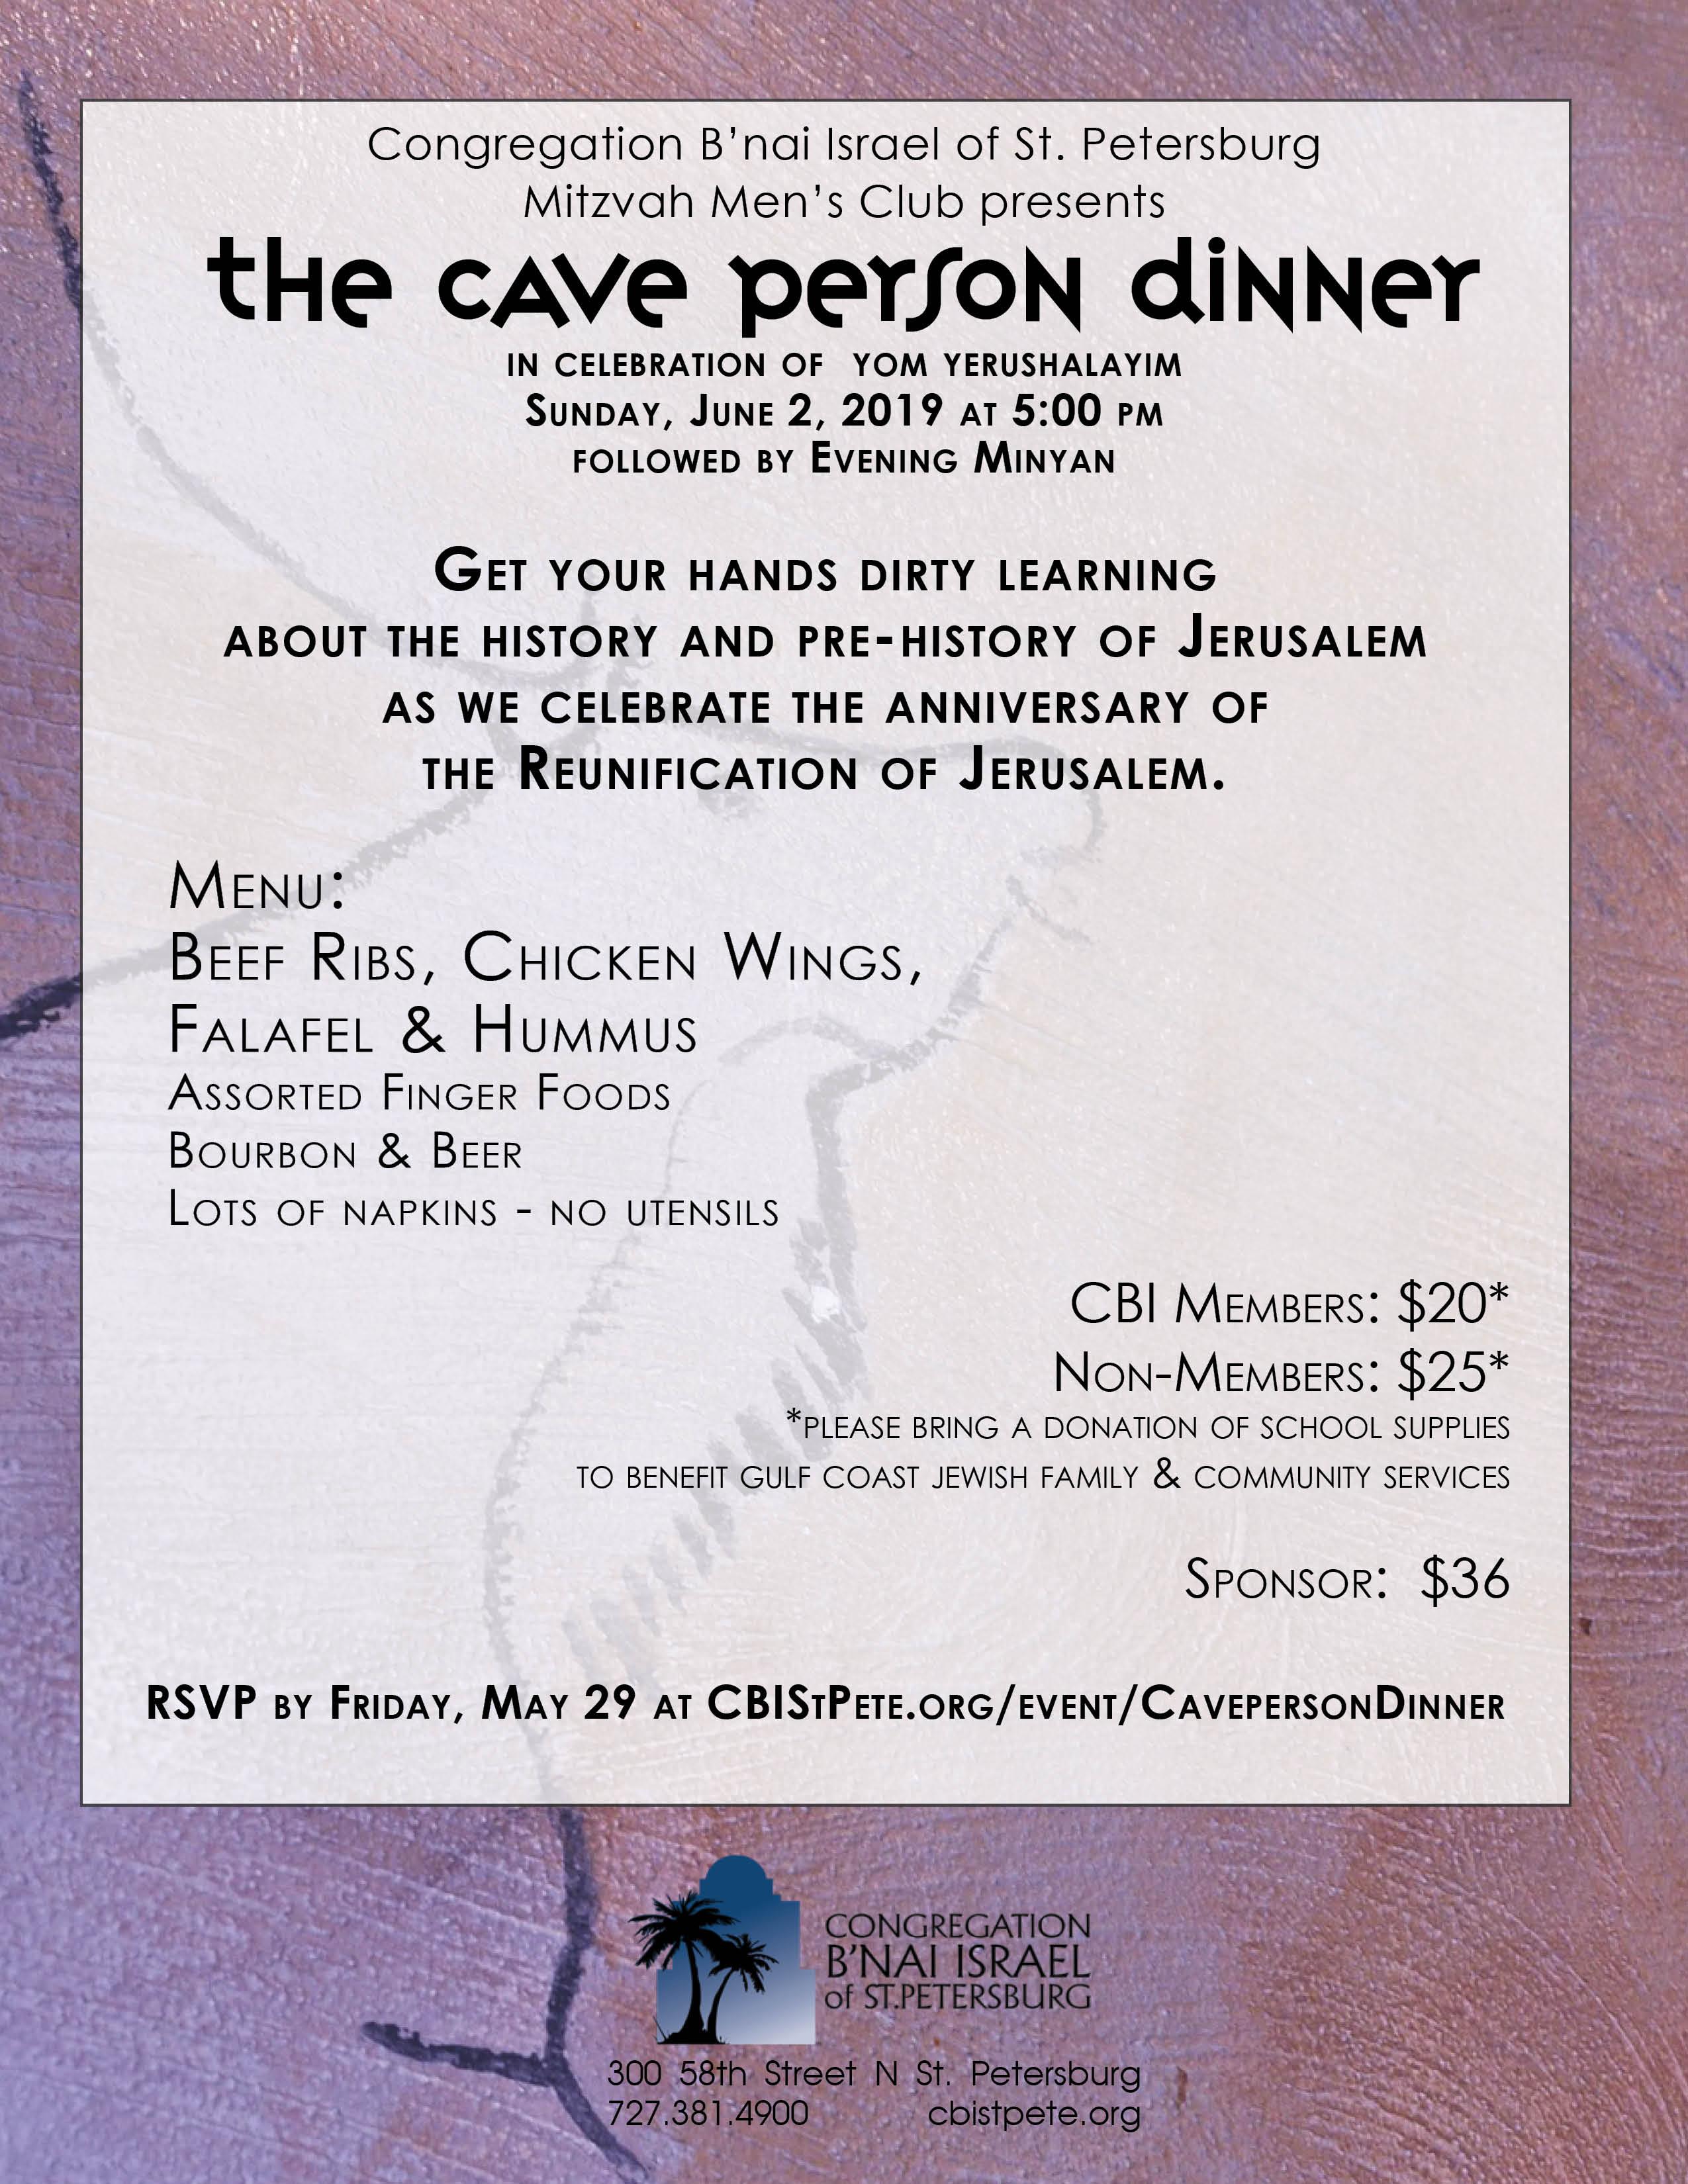 CBI Cave Person Dinner | Jewish Federation of Florida's Gulf Coast